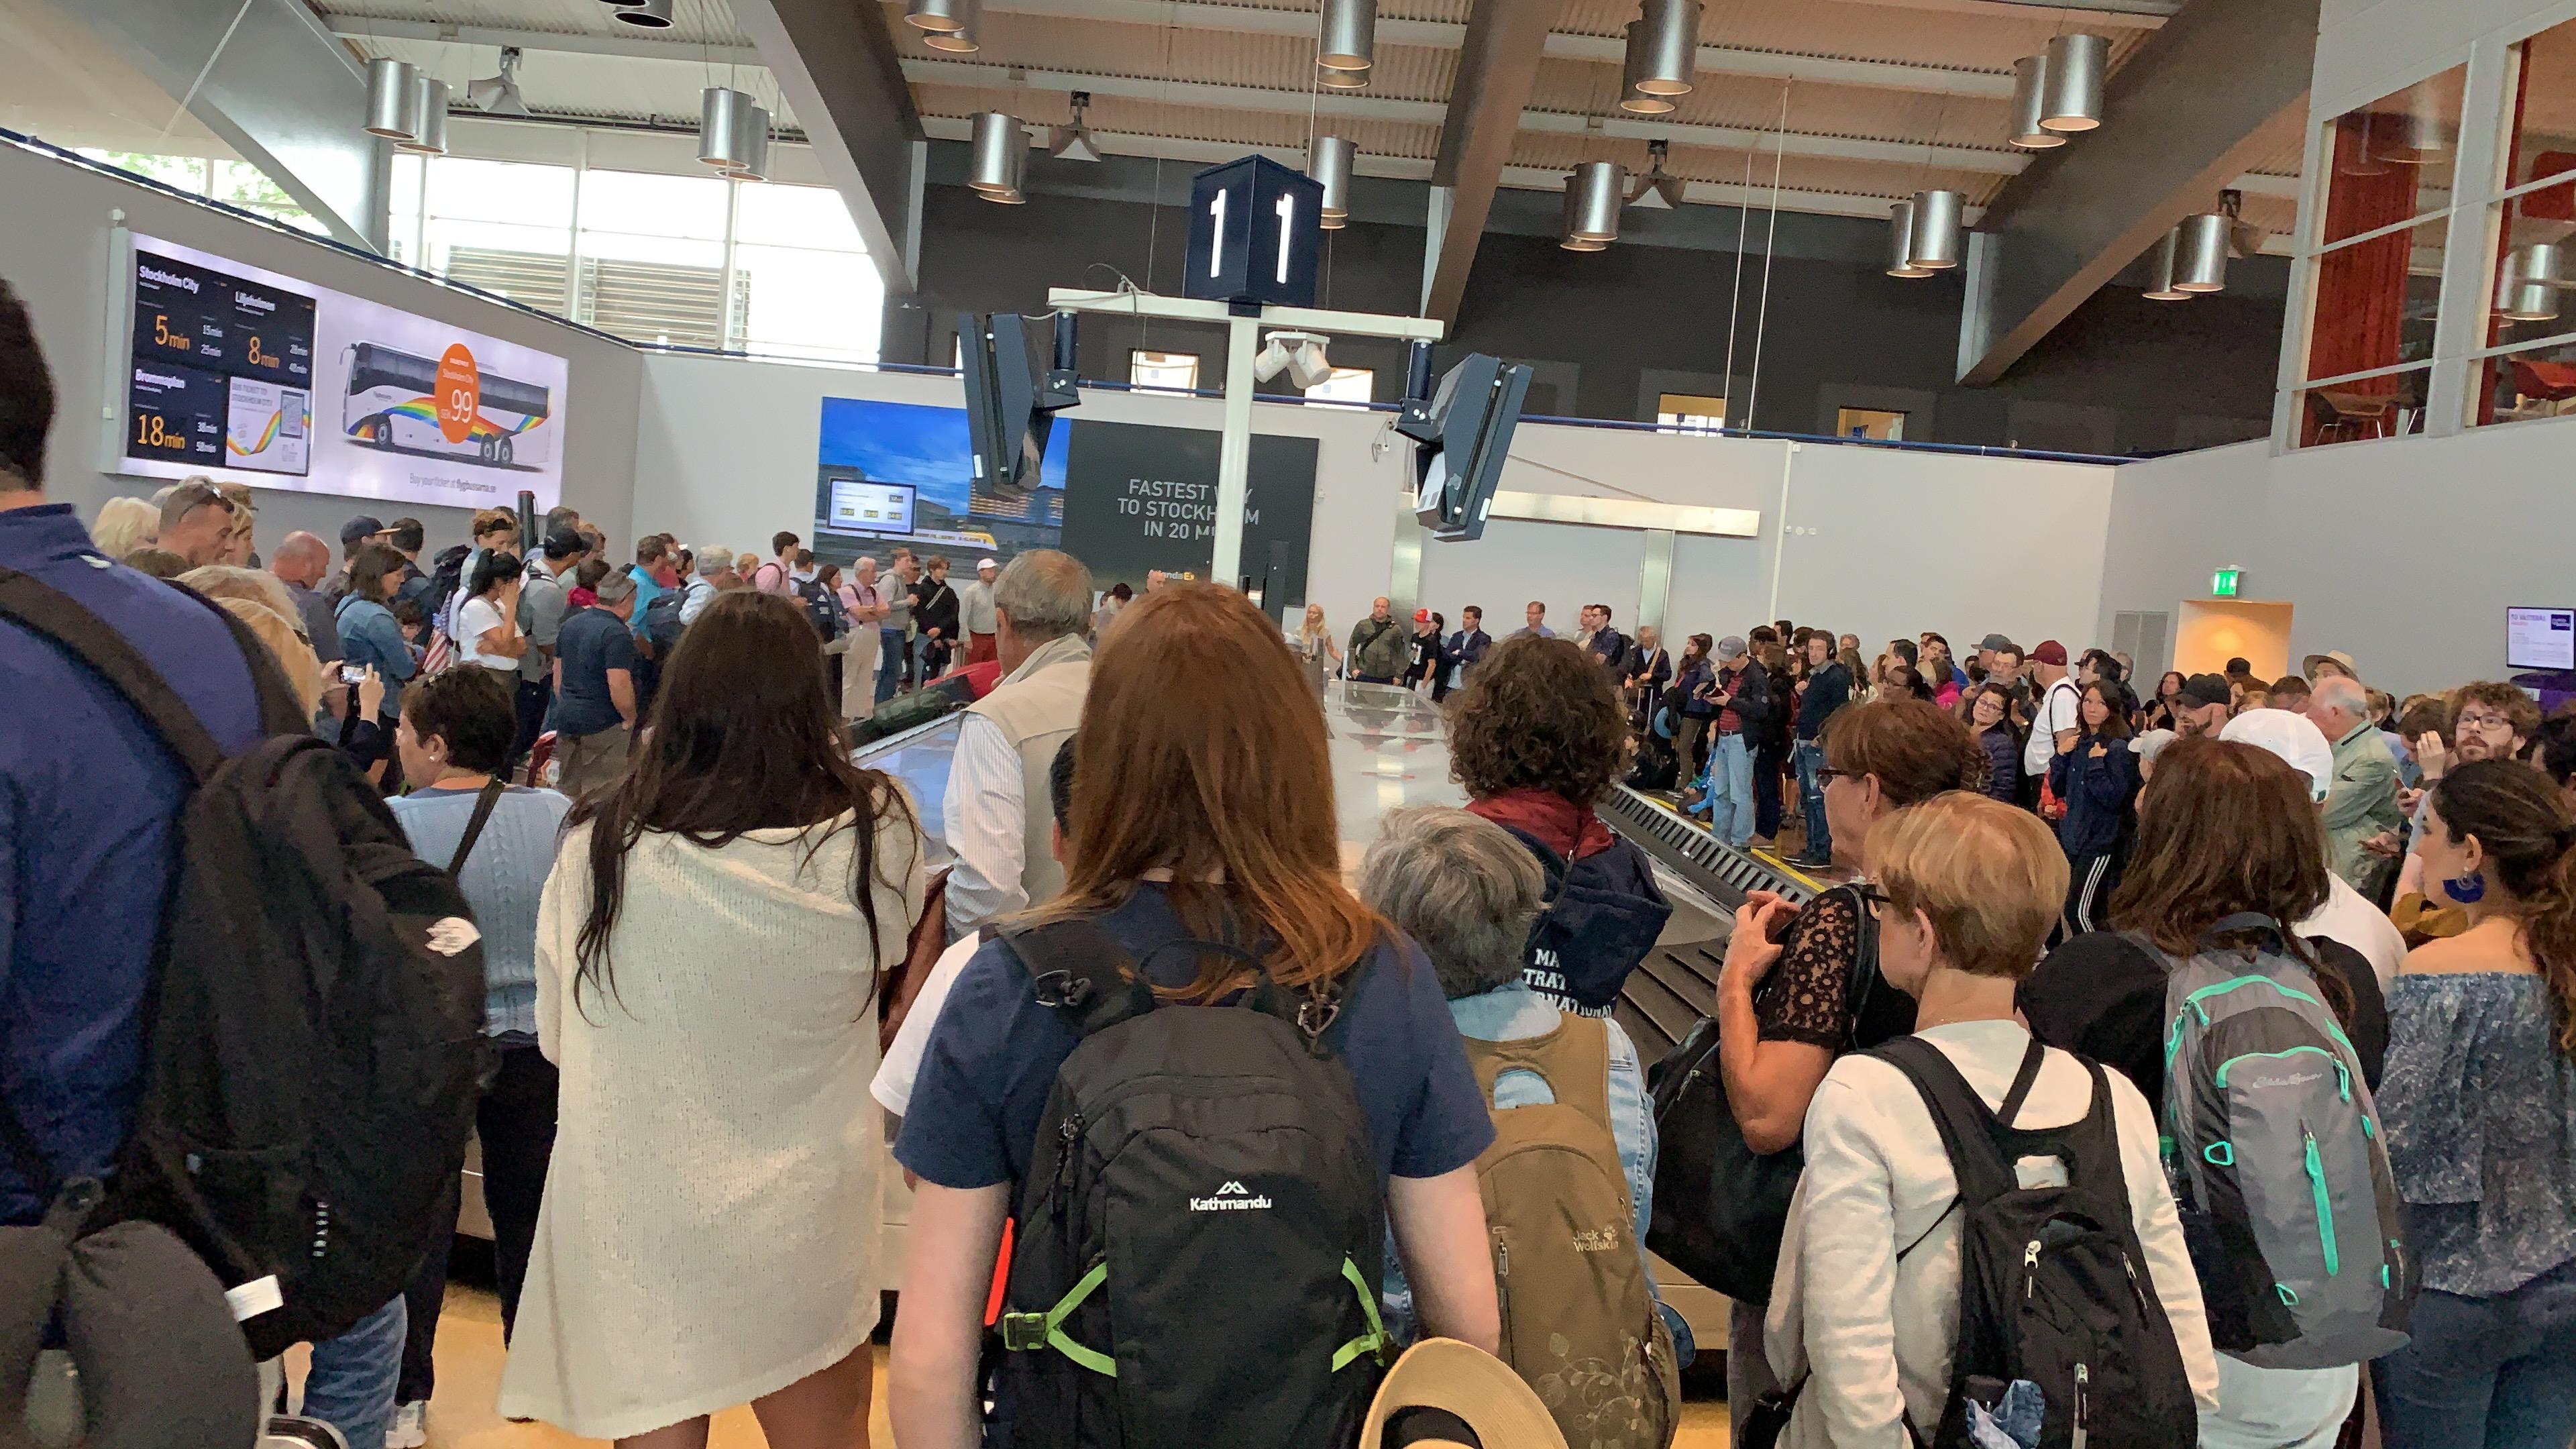 Stockholm Arlanda Airport Customer Reviews | SKYTRAX